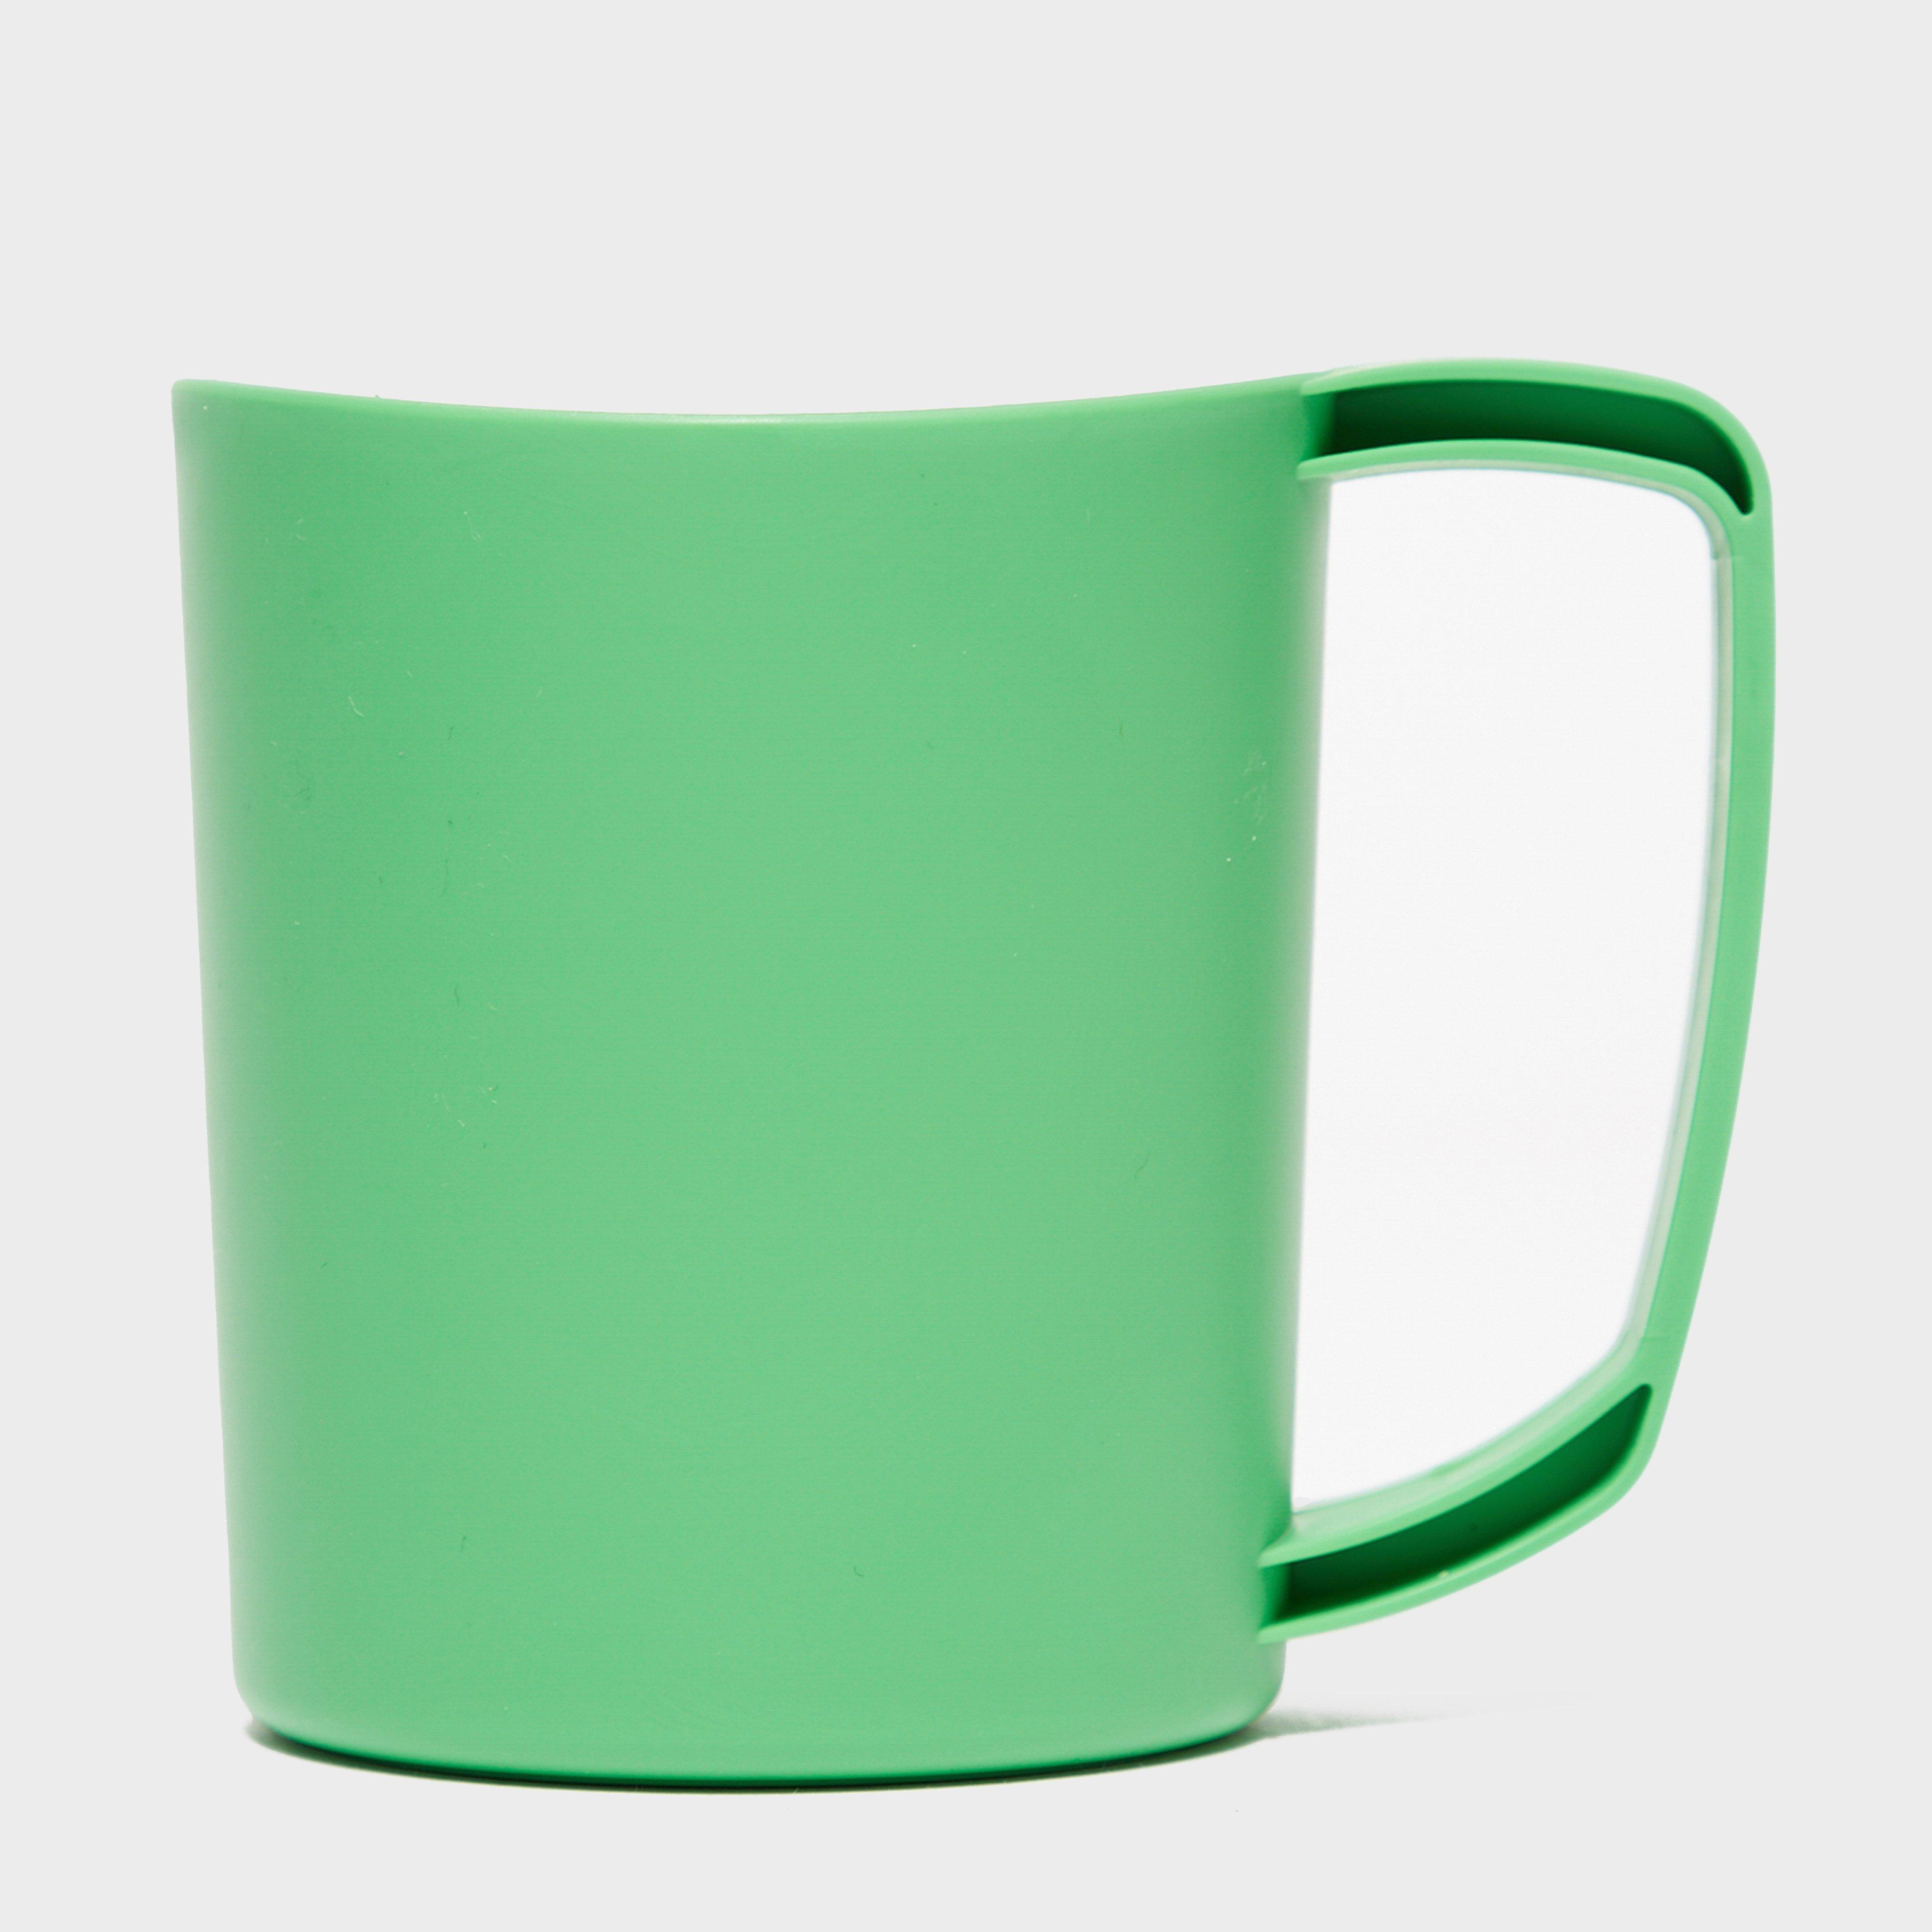 Lifeventure Lifeventure Ellipse Mug - Green, Green